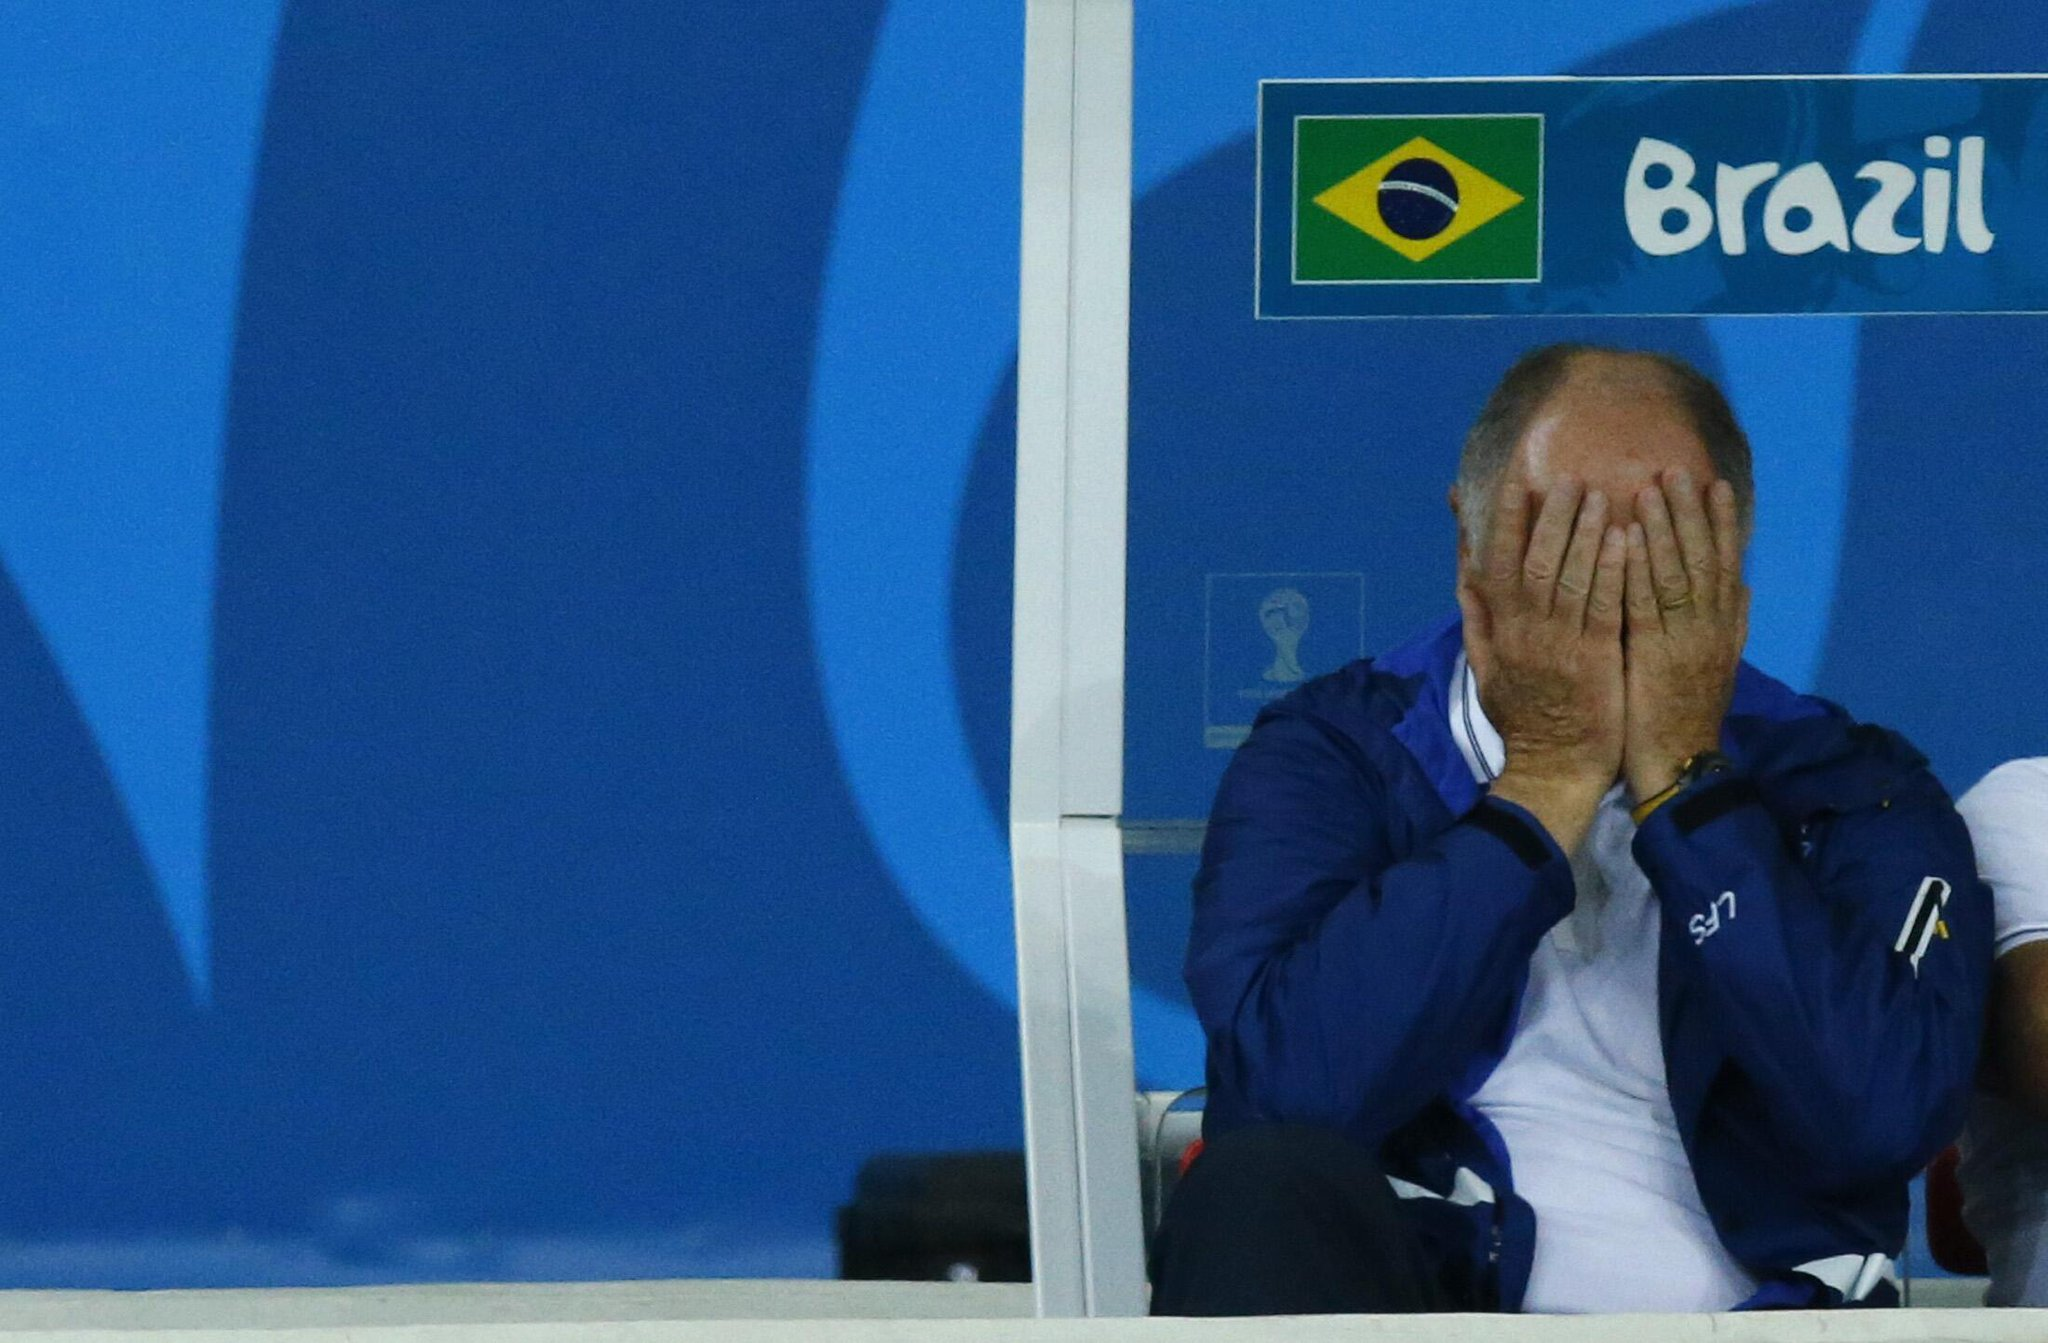 David Luiz, Dari Harapan Menjadi Makian di Laga Brasil vs Jerman - berita Internasional Piala Dunia